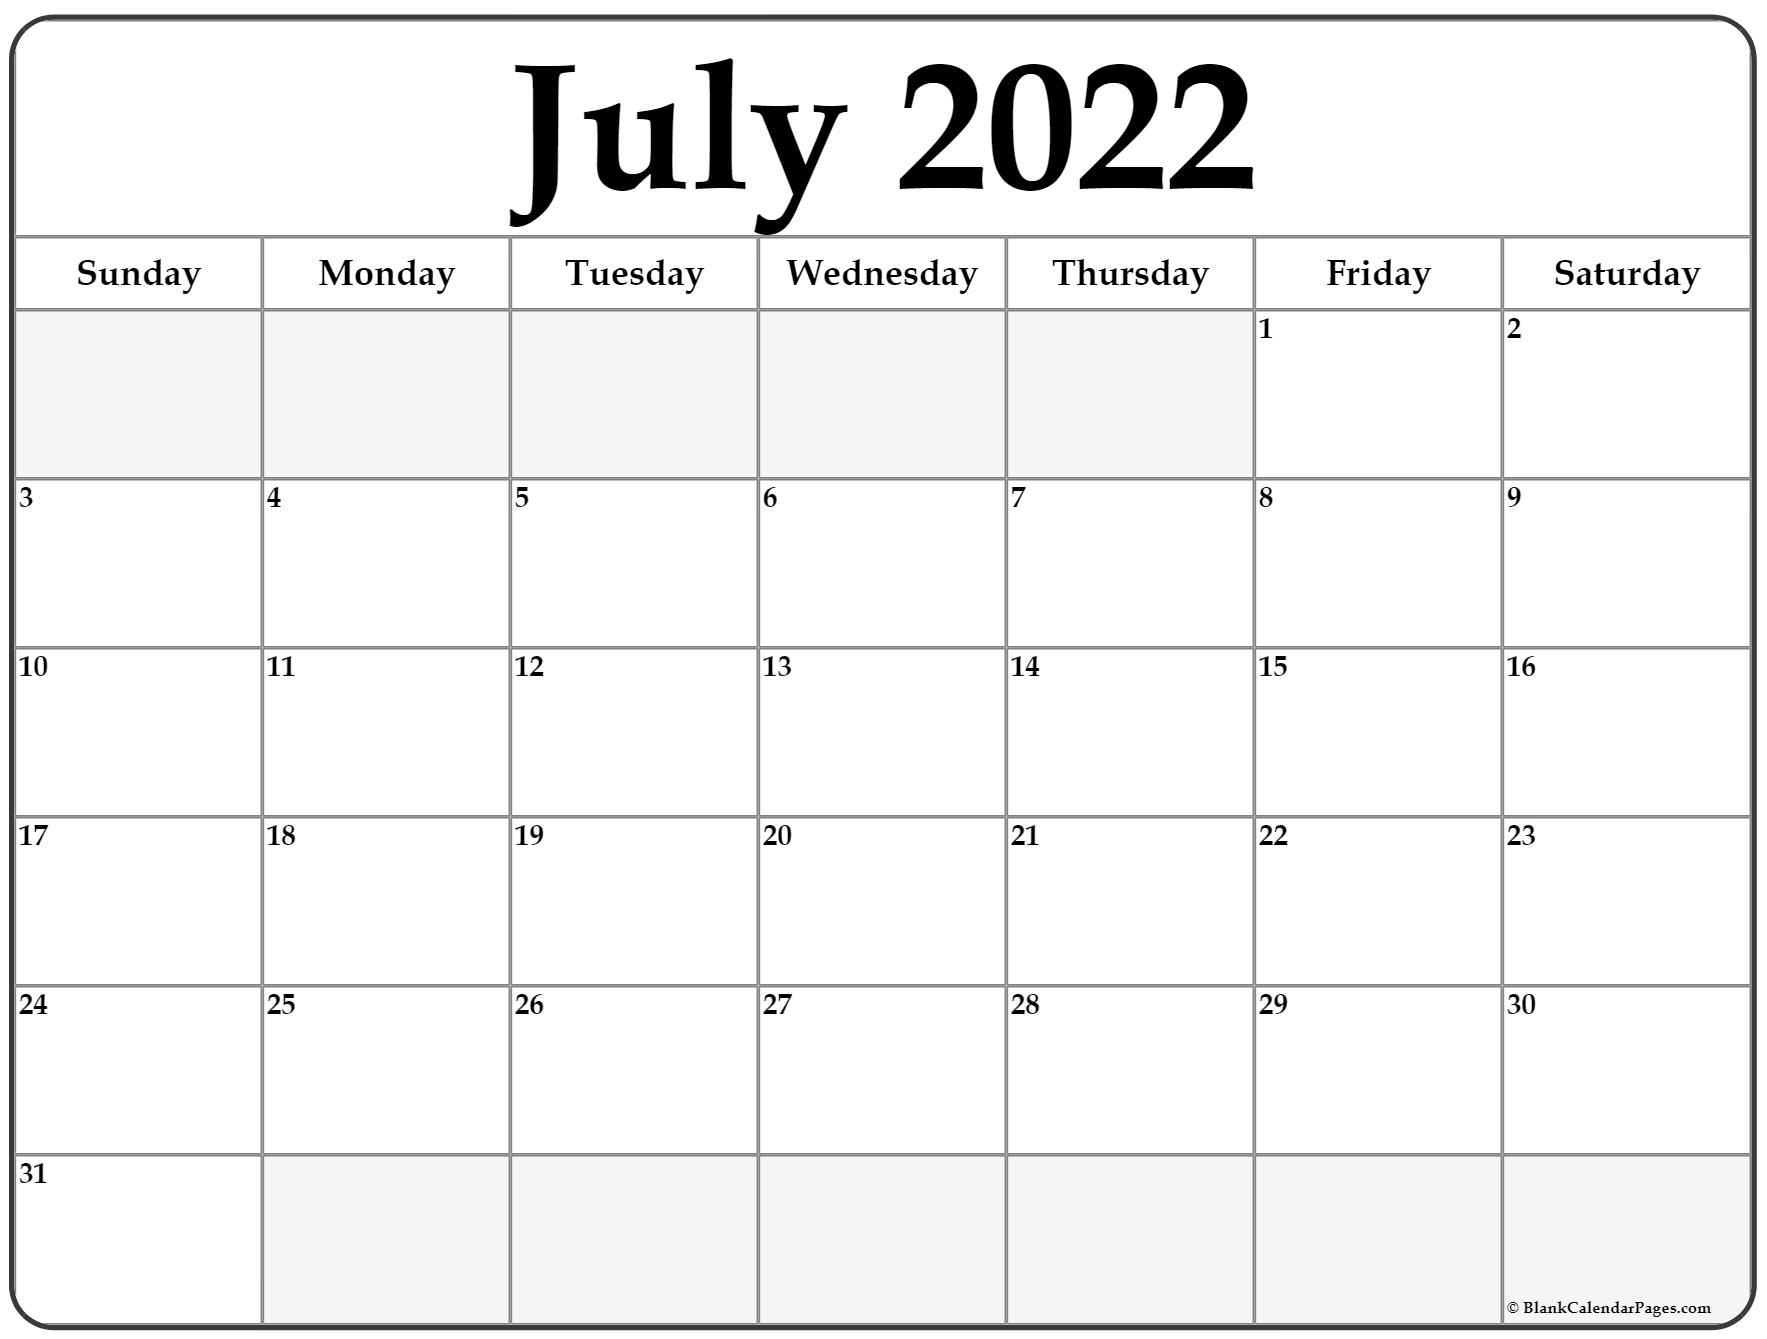 Sure, digital calendars are convenient — we can take them everyw. July 2022 calendar | free printable calendar templates